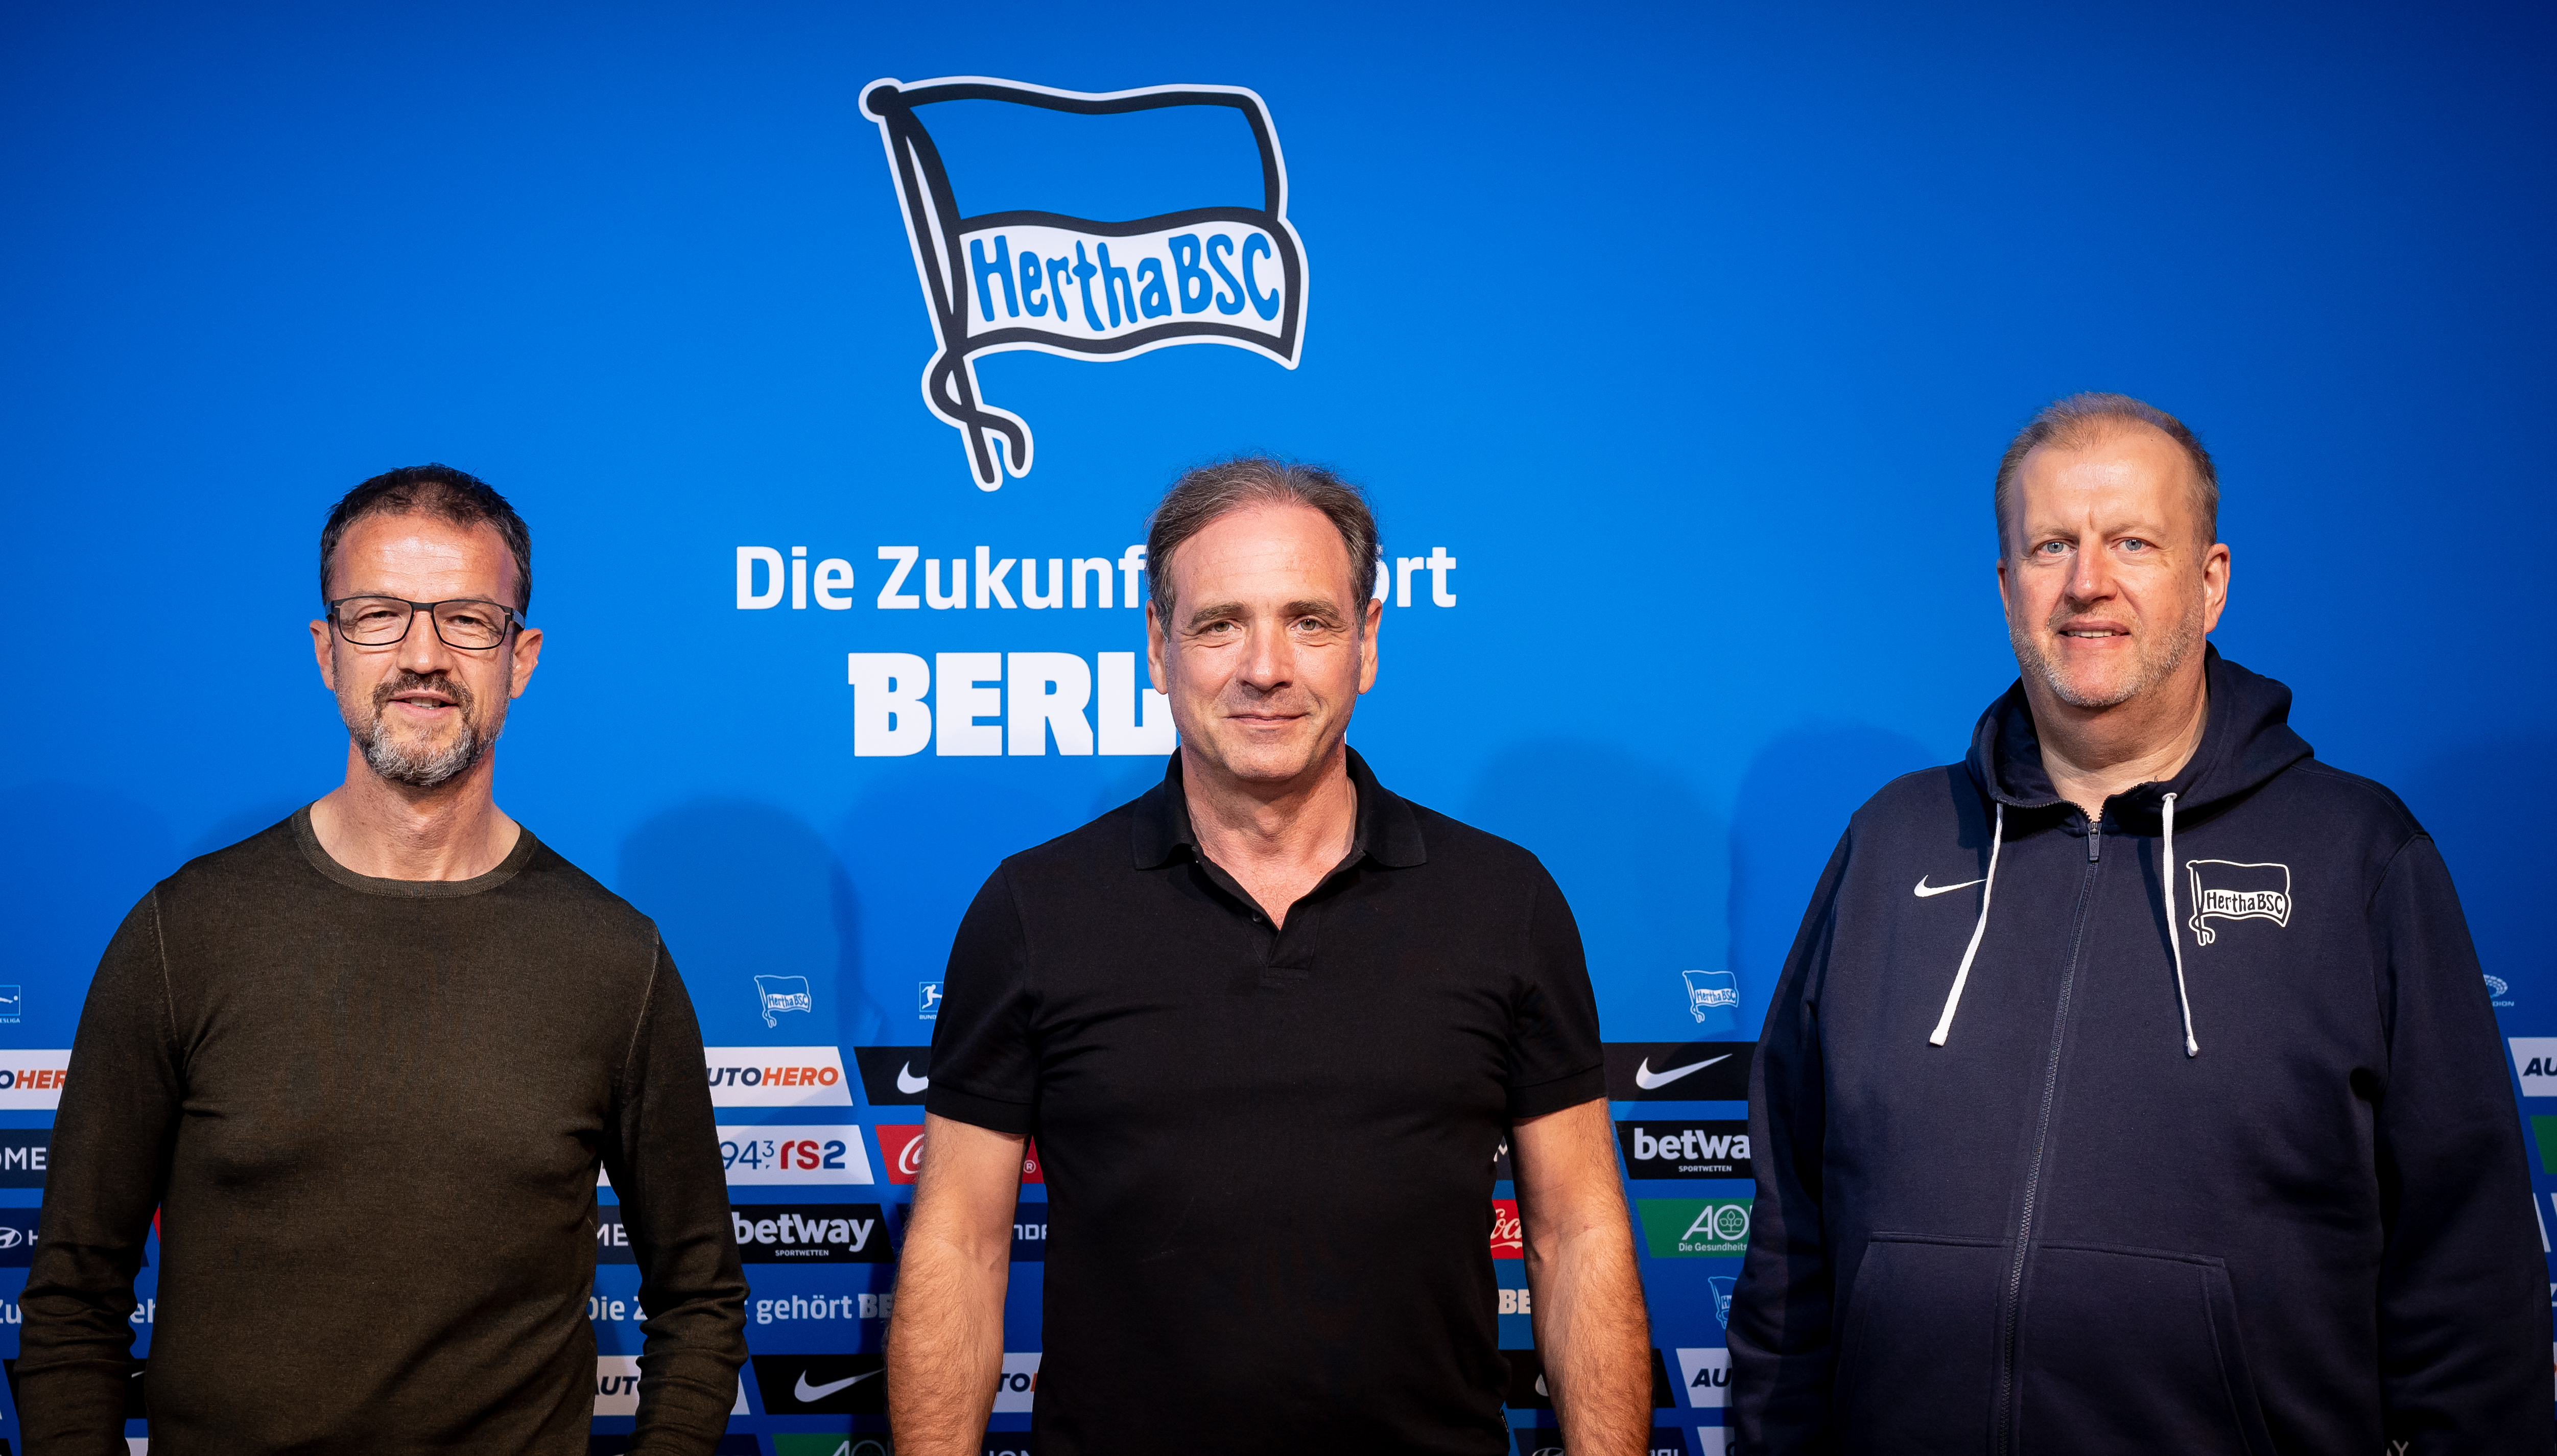 Fredi Bobic, Carsten Schmidt and Ingo Schiller standing in front of the Hertha badge.